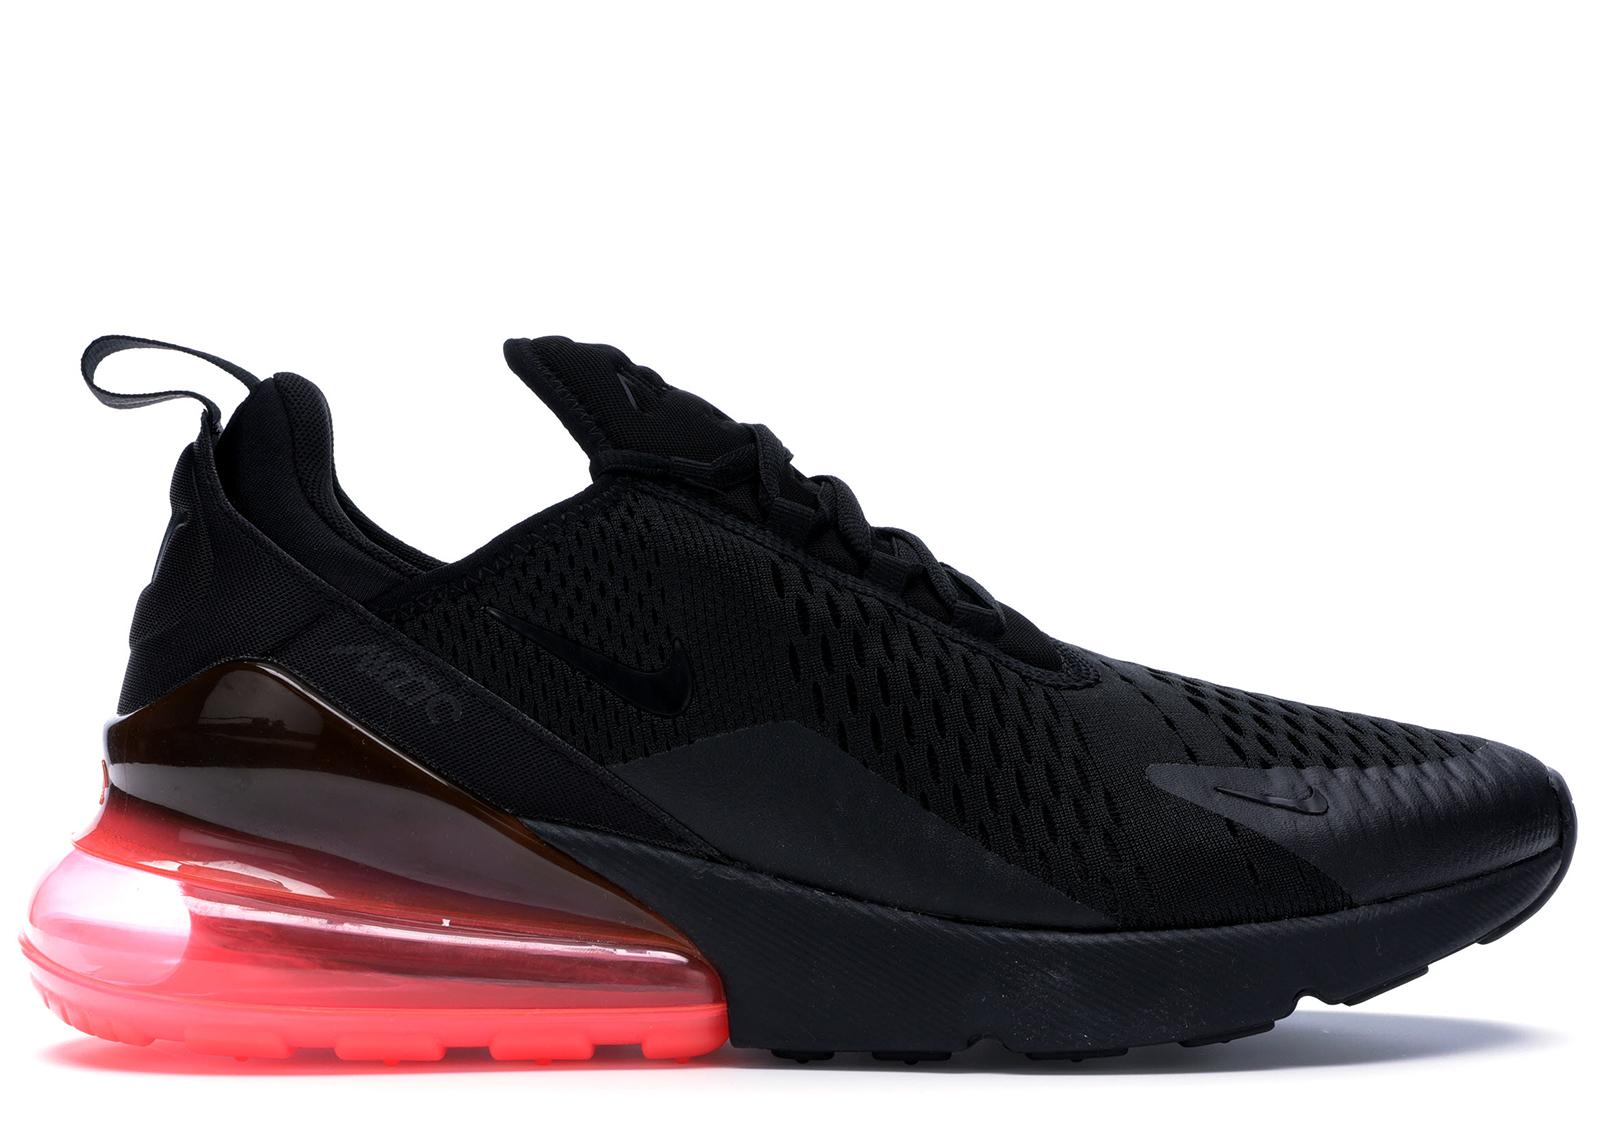 Nike Air Max 270 Black Hot Punch